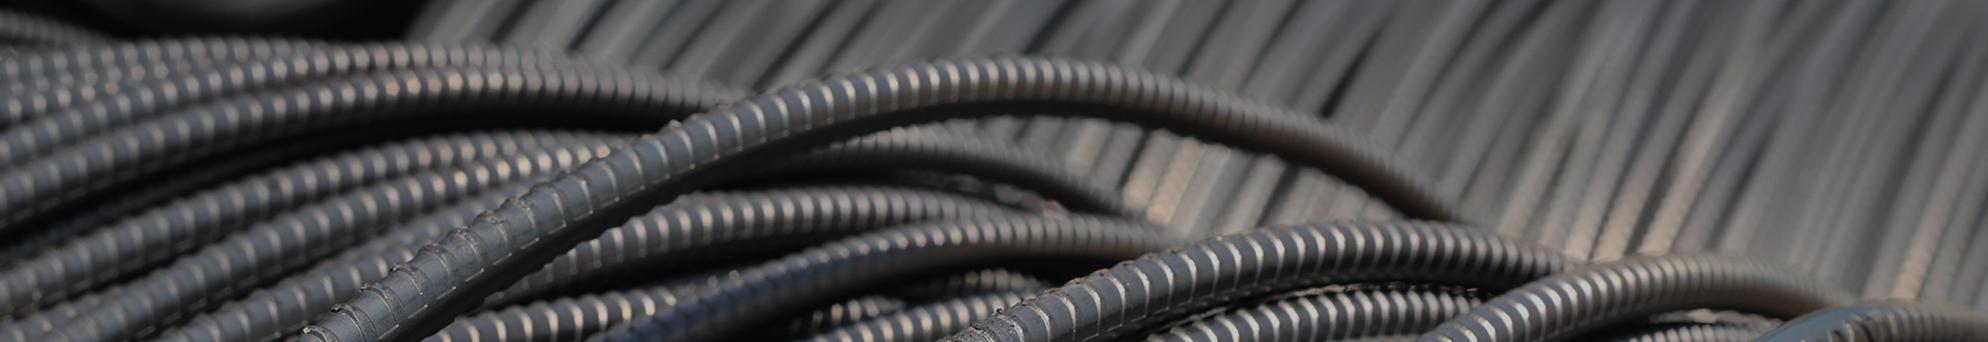 Buy Fabrication Steel Online